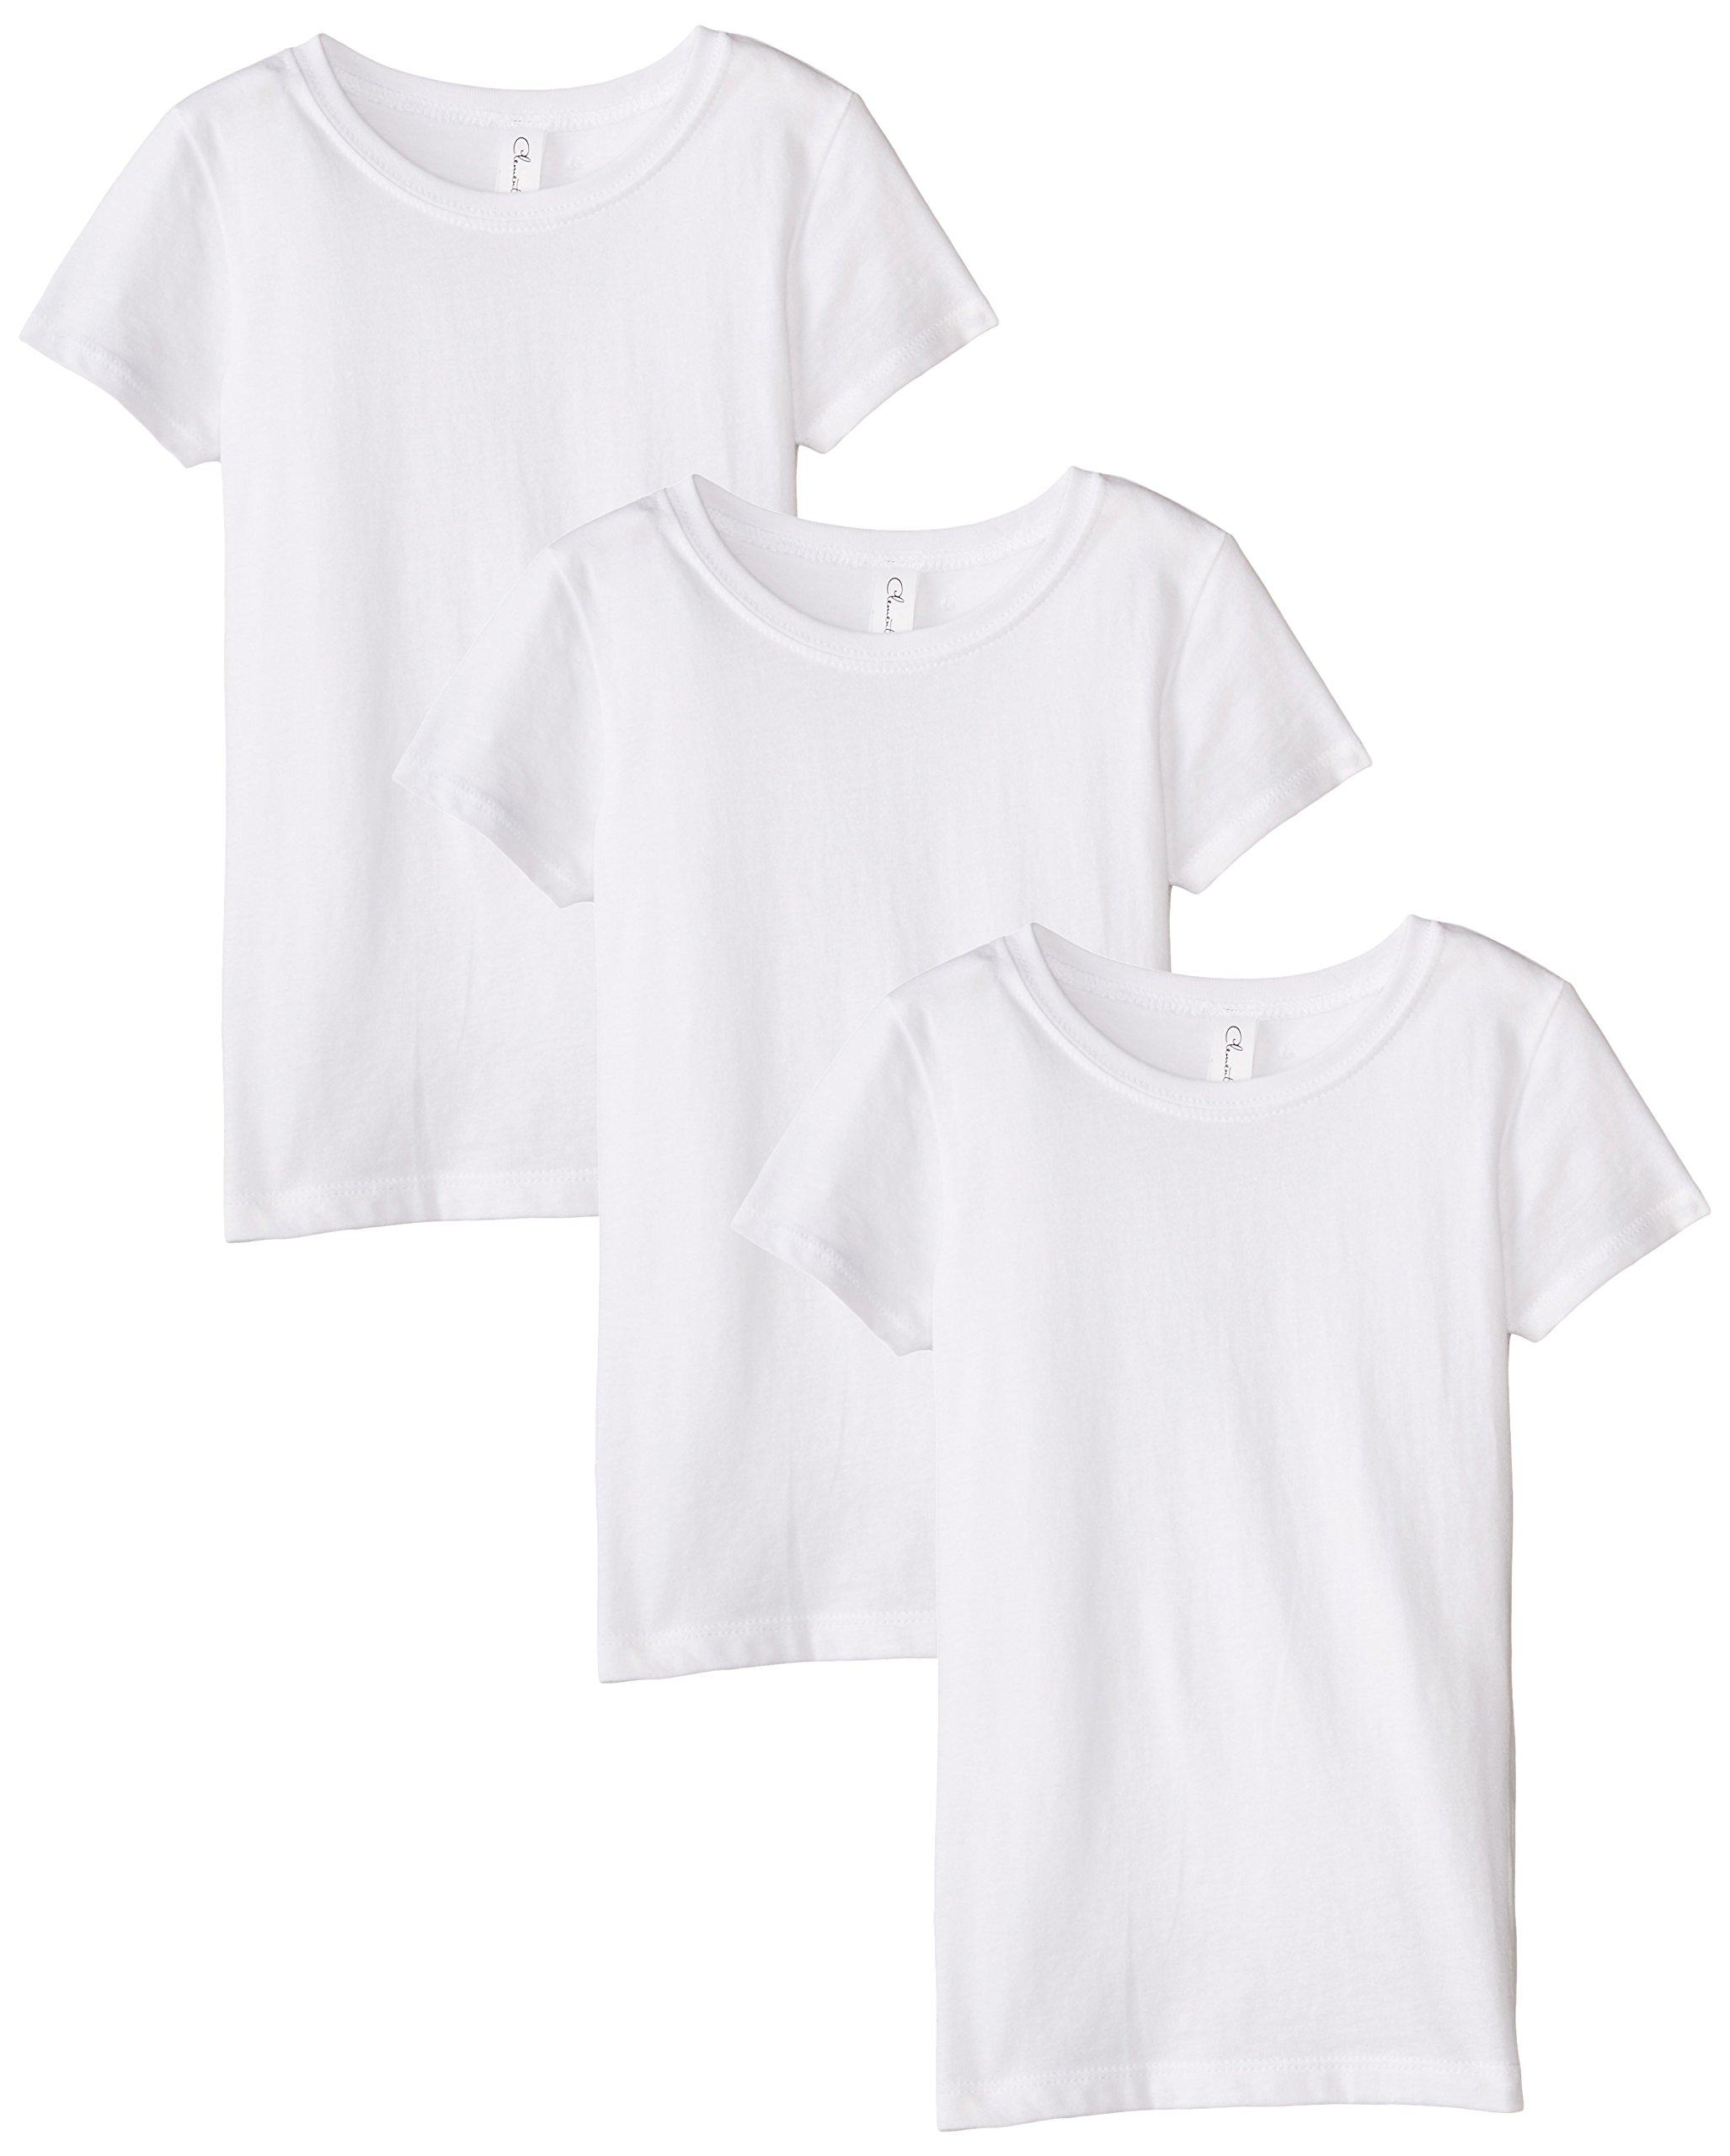 Clementine Big Girls' Everyday Crewneck Tee 3-Pack, White, Large